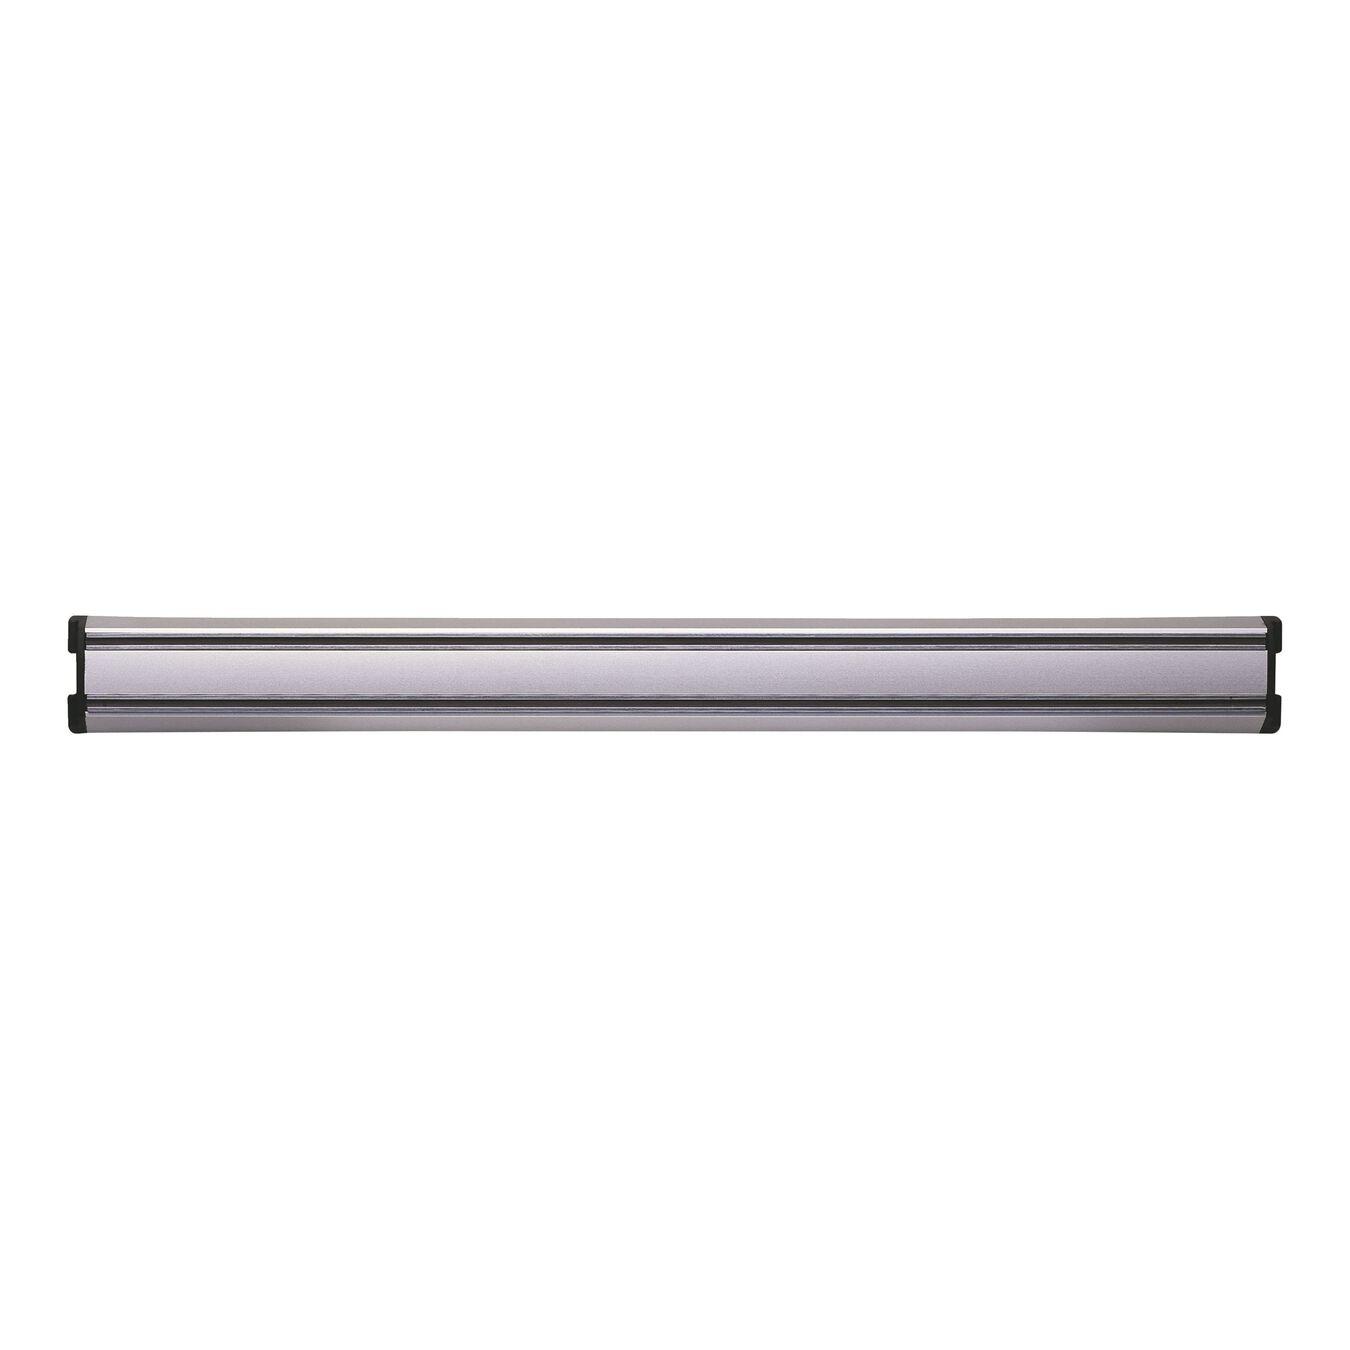 Magnetic knife bar 45 cm aluminium,,large 1